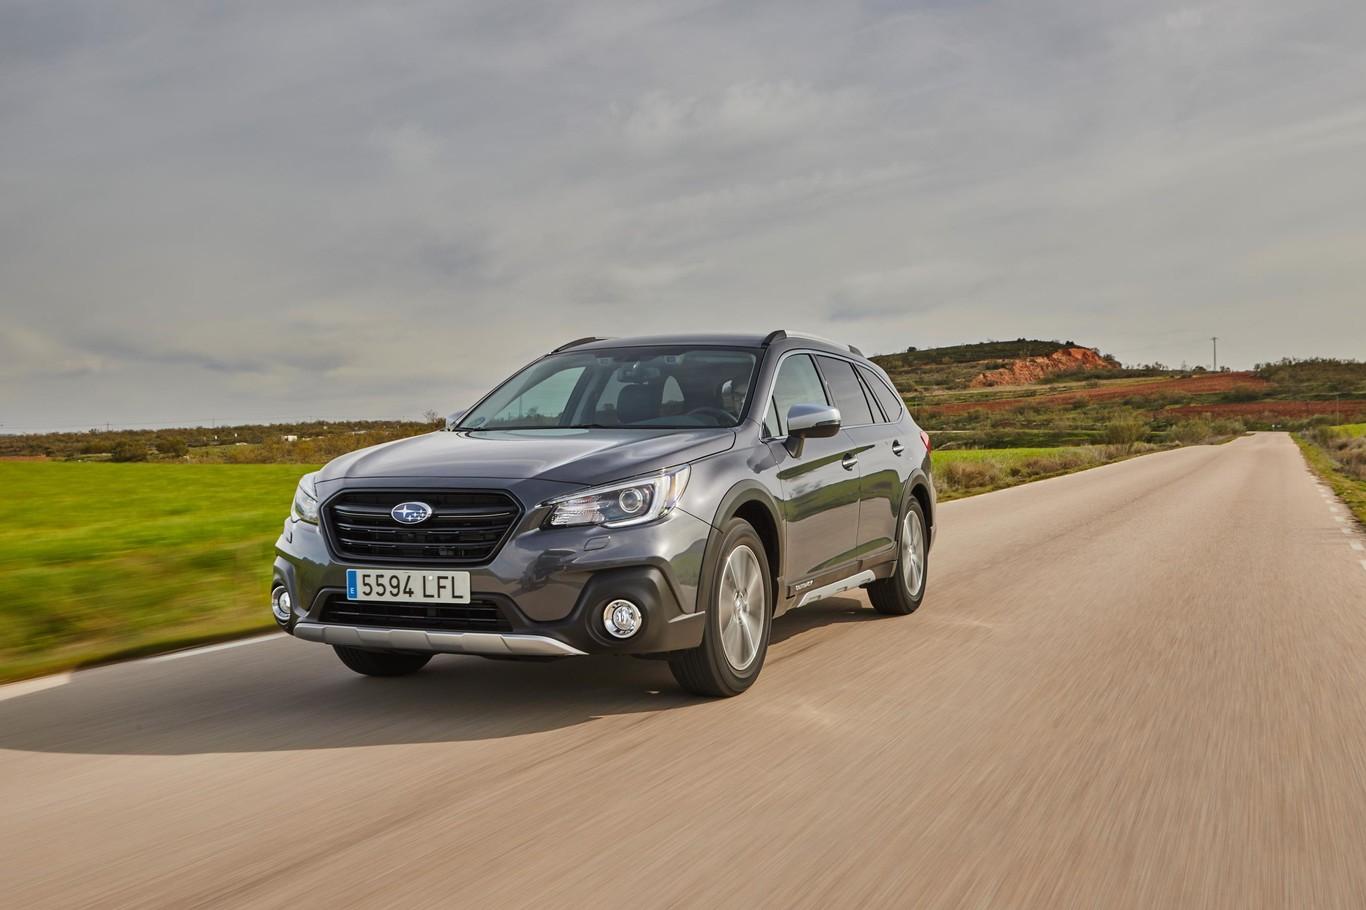 2020 Subaru Outback Turbo Hybrid History